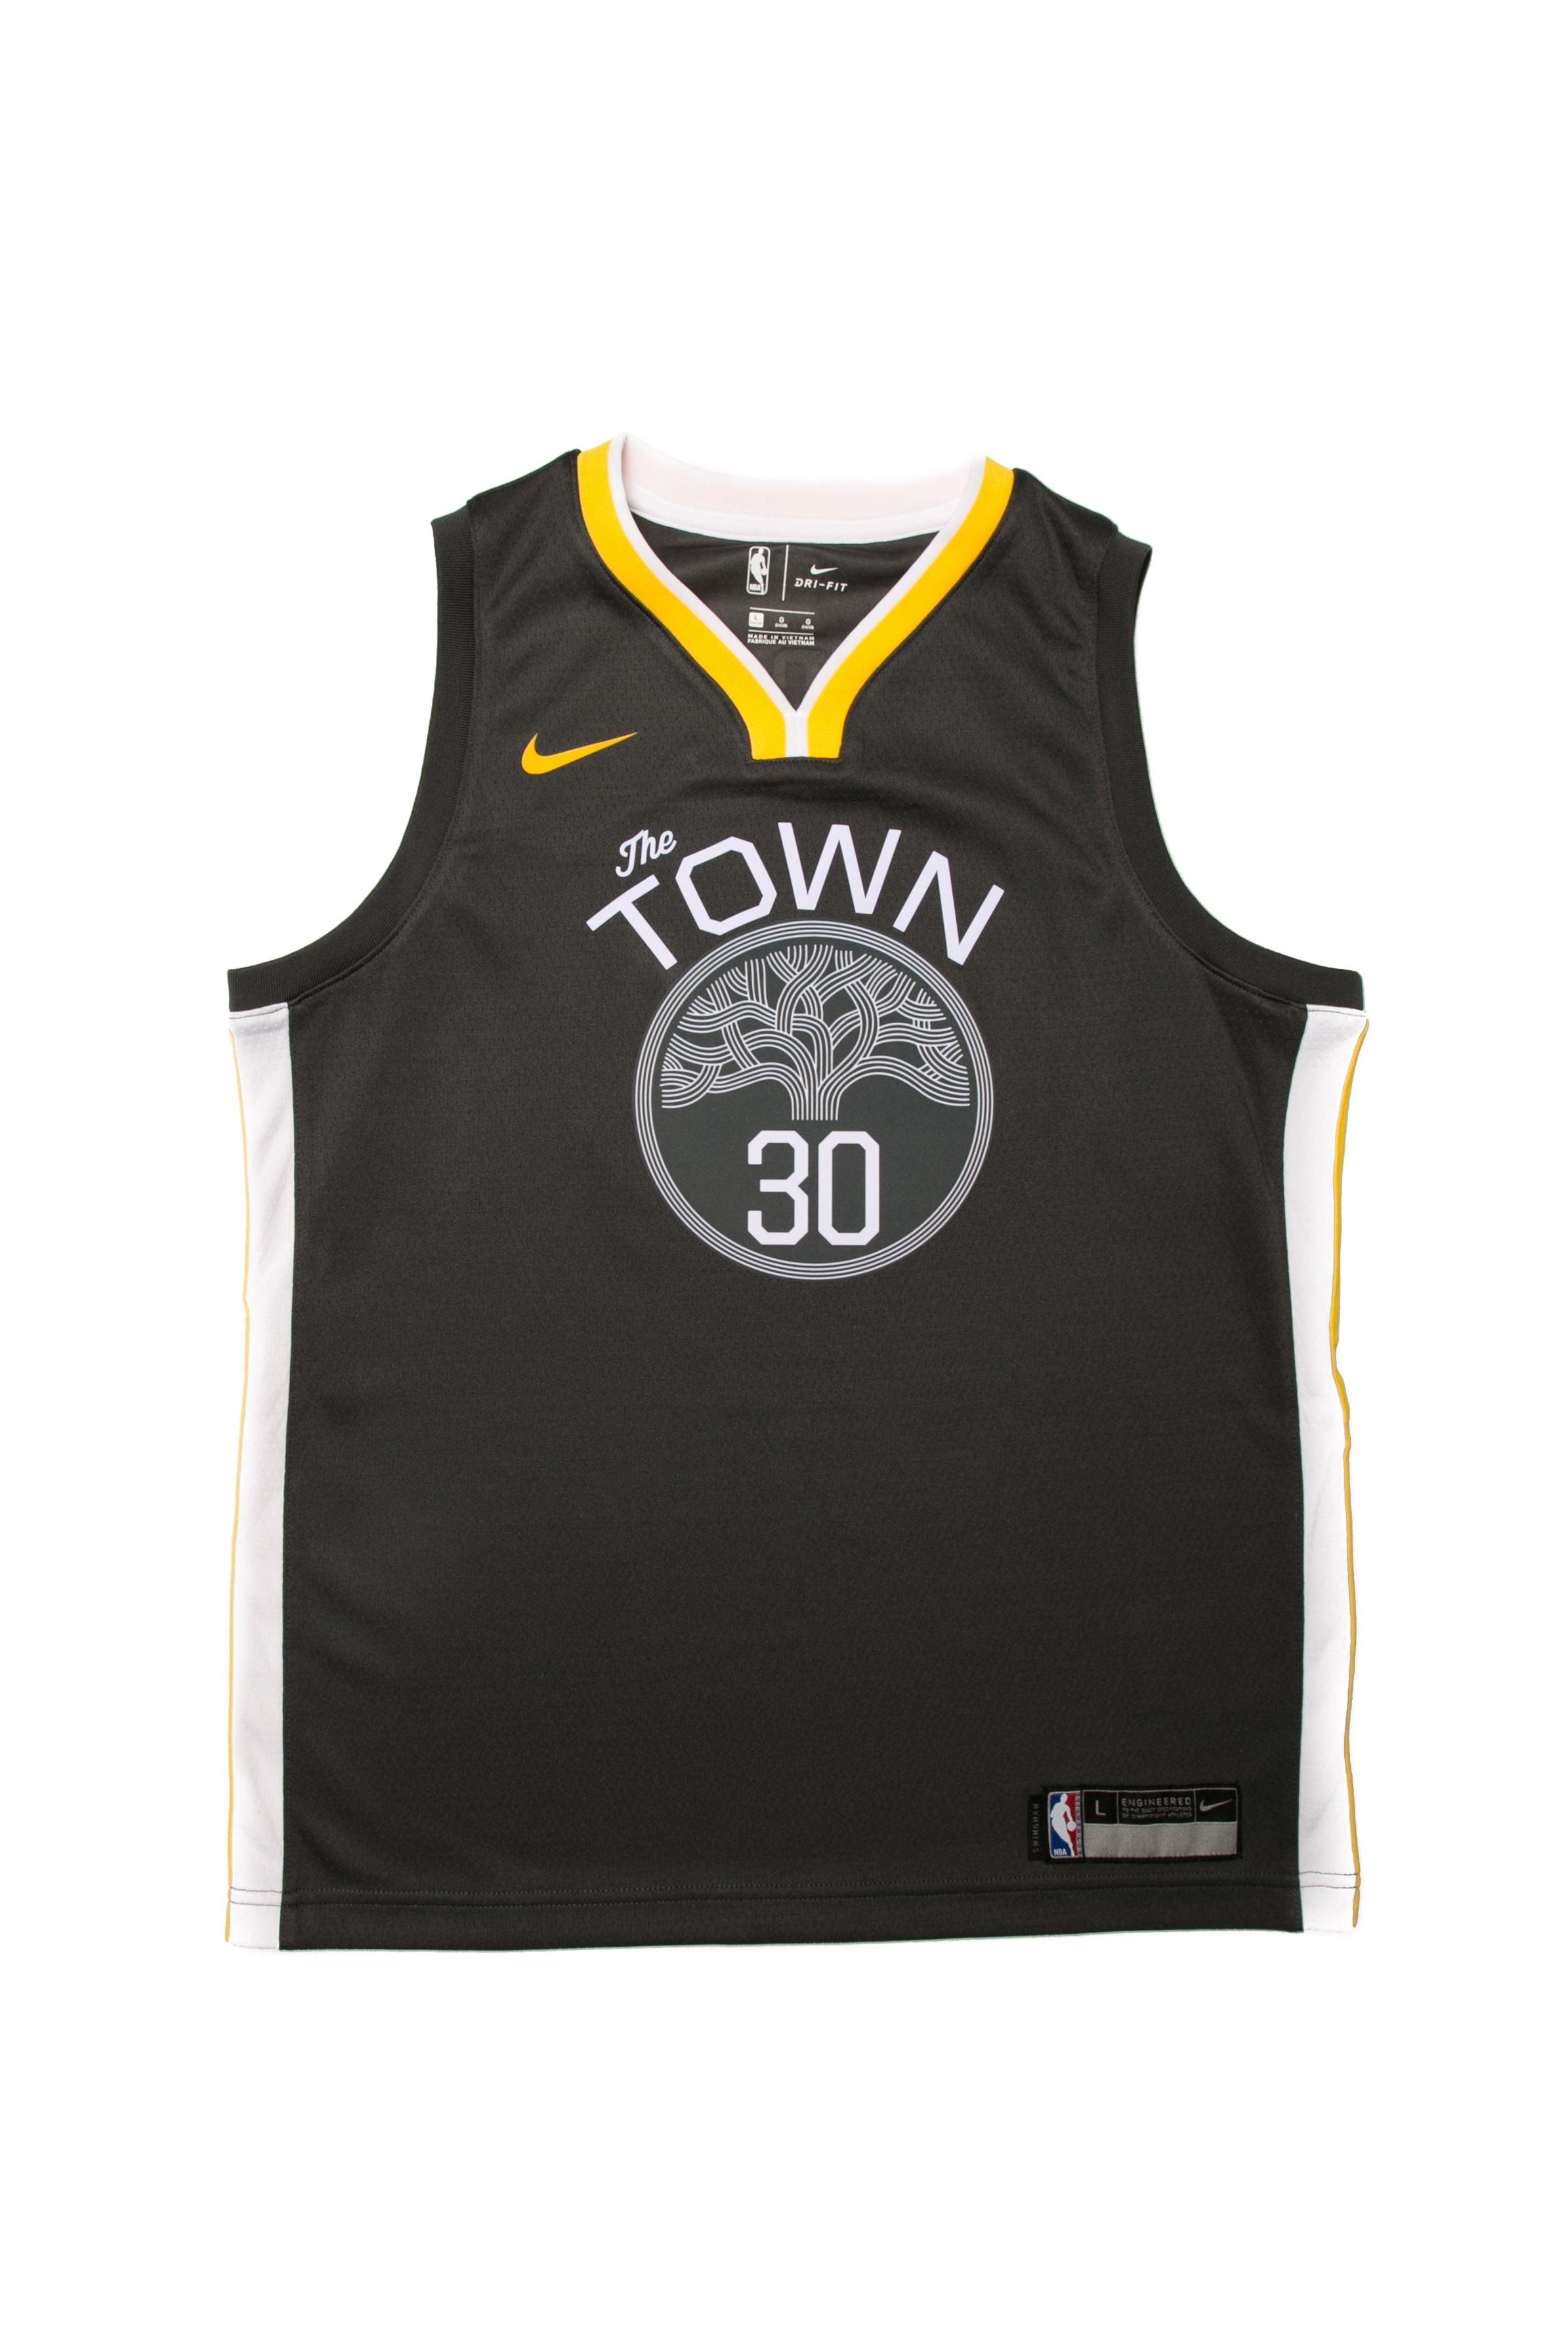 Stephen Curry #30 Nike Statement Edition Youth Swingman Jersey Black